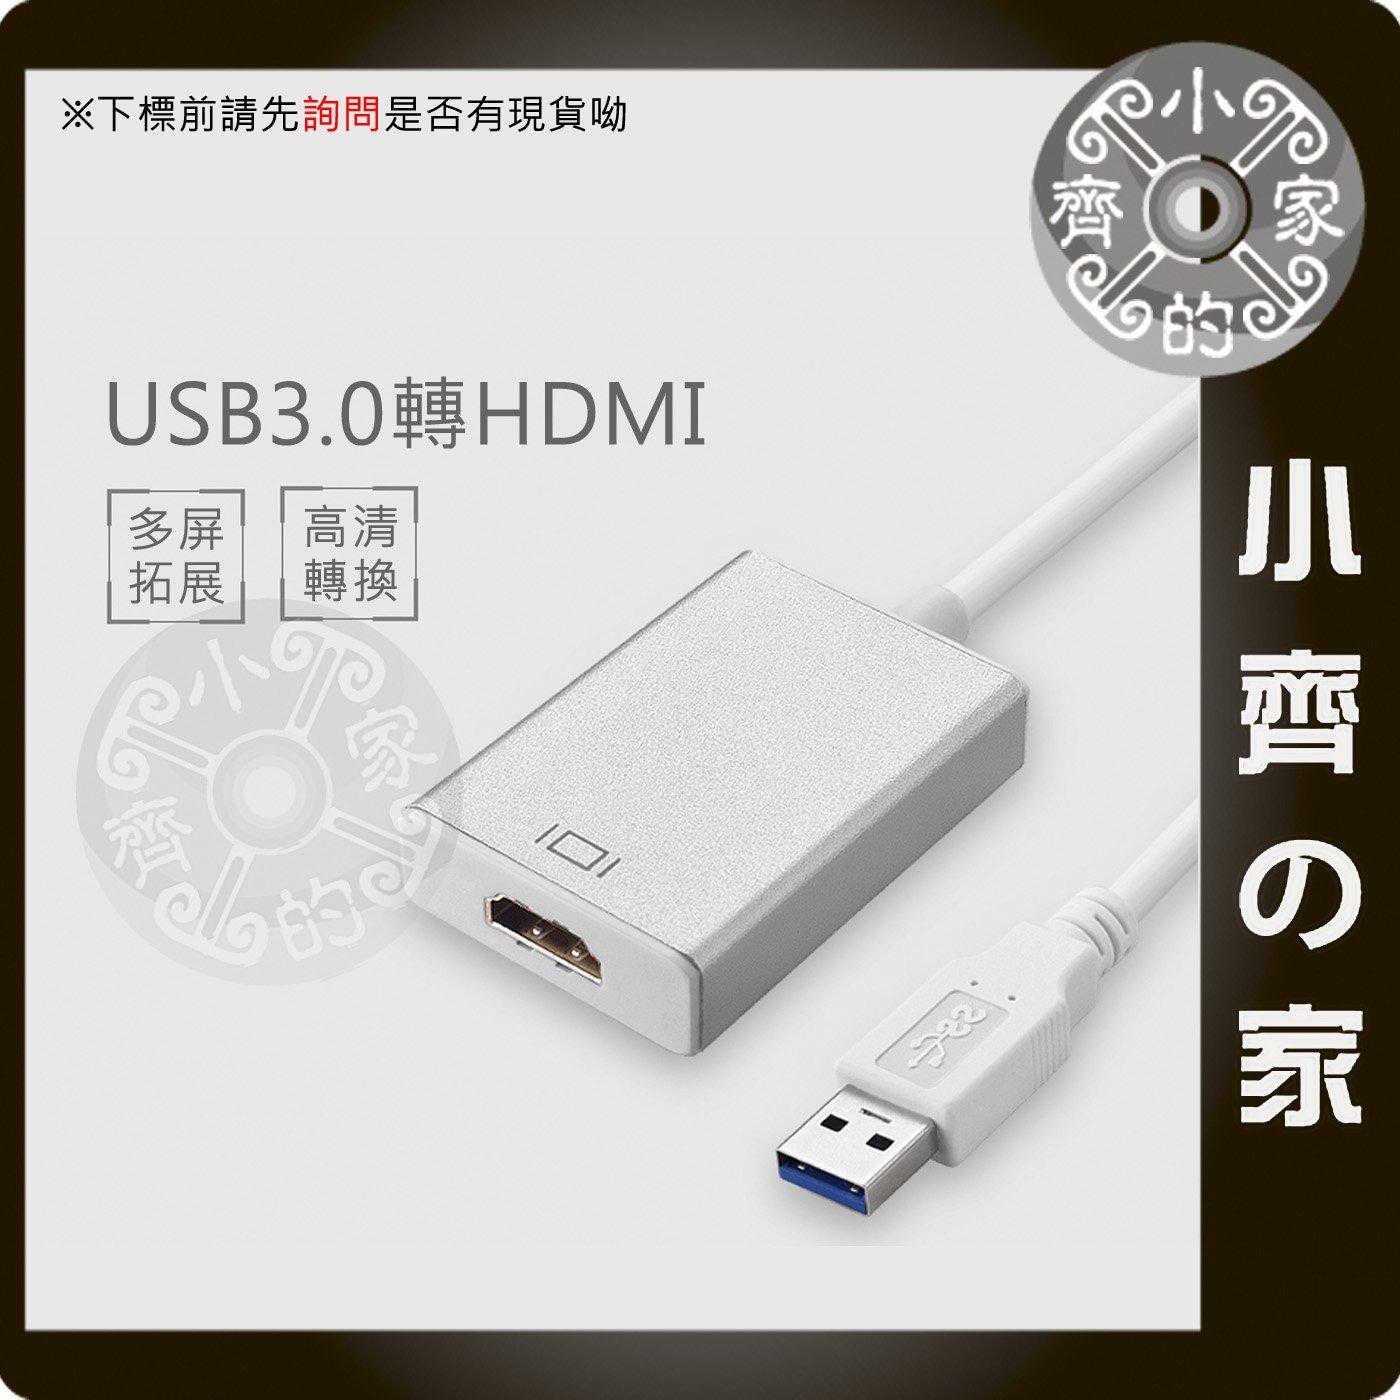 USB 3.0 2.0 轉 HDMI 影像訊號線 USB TO HDMI 外接顯示卡 螢幕視頻線 小齊的家